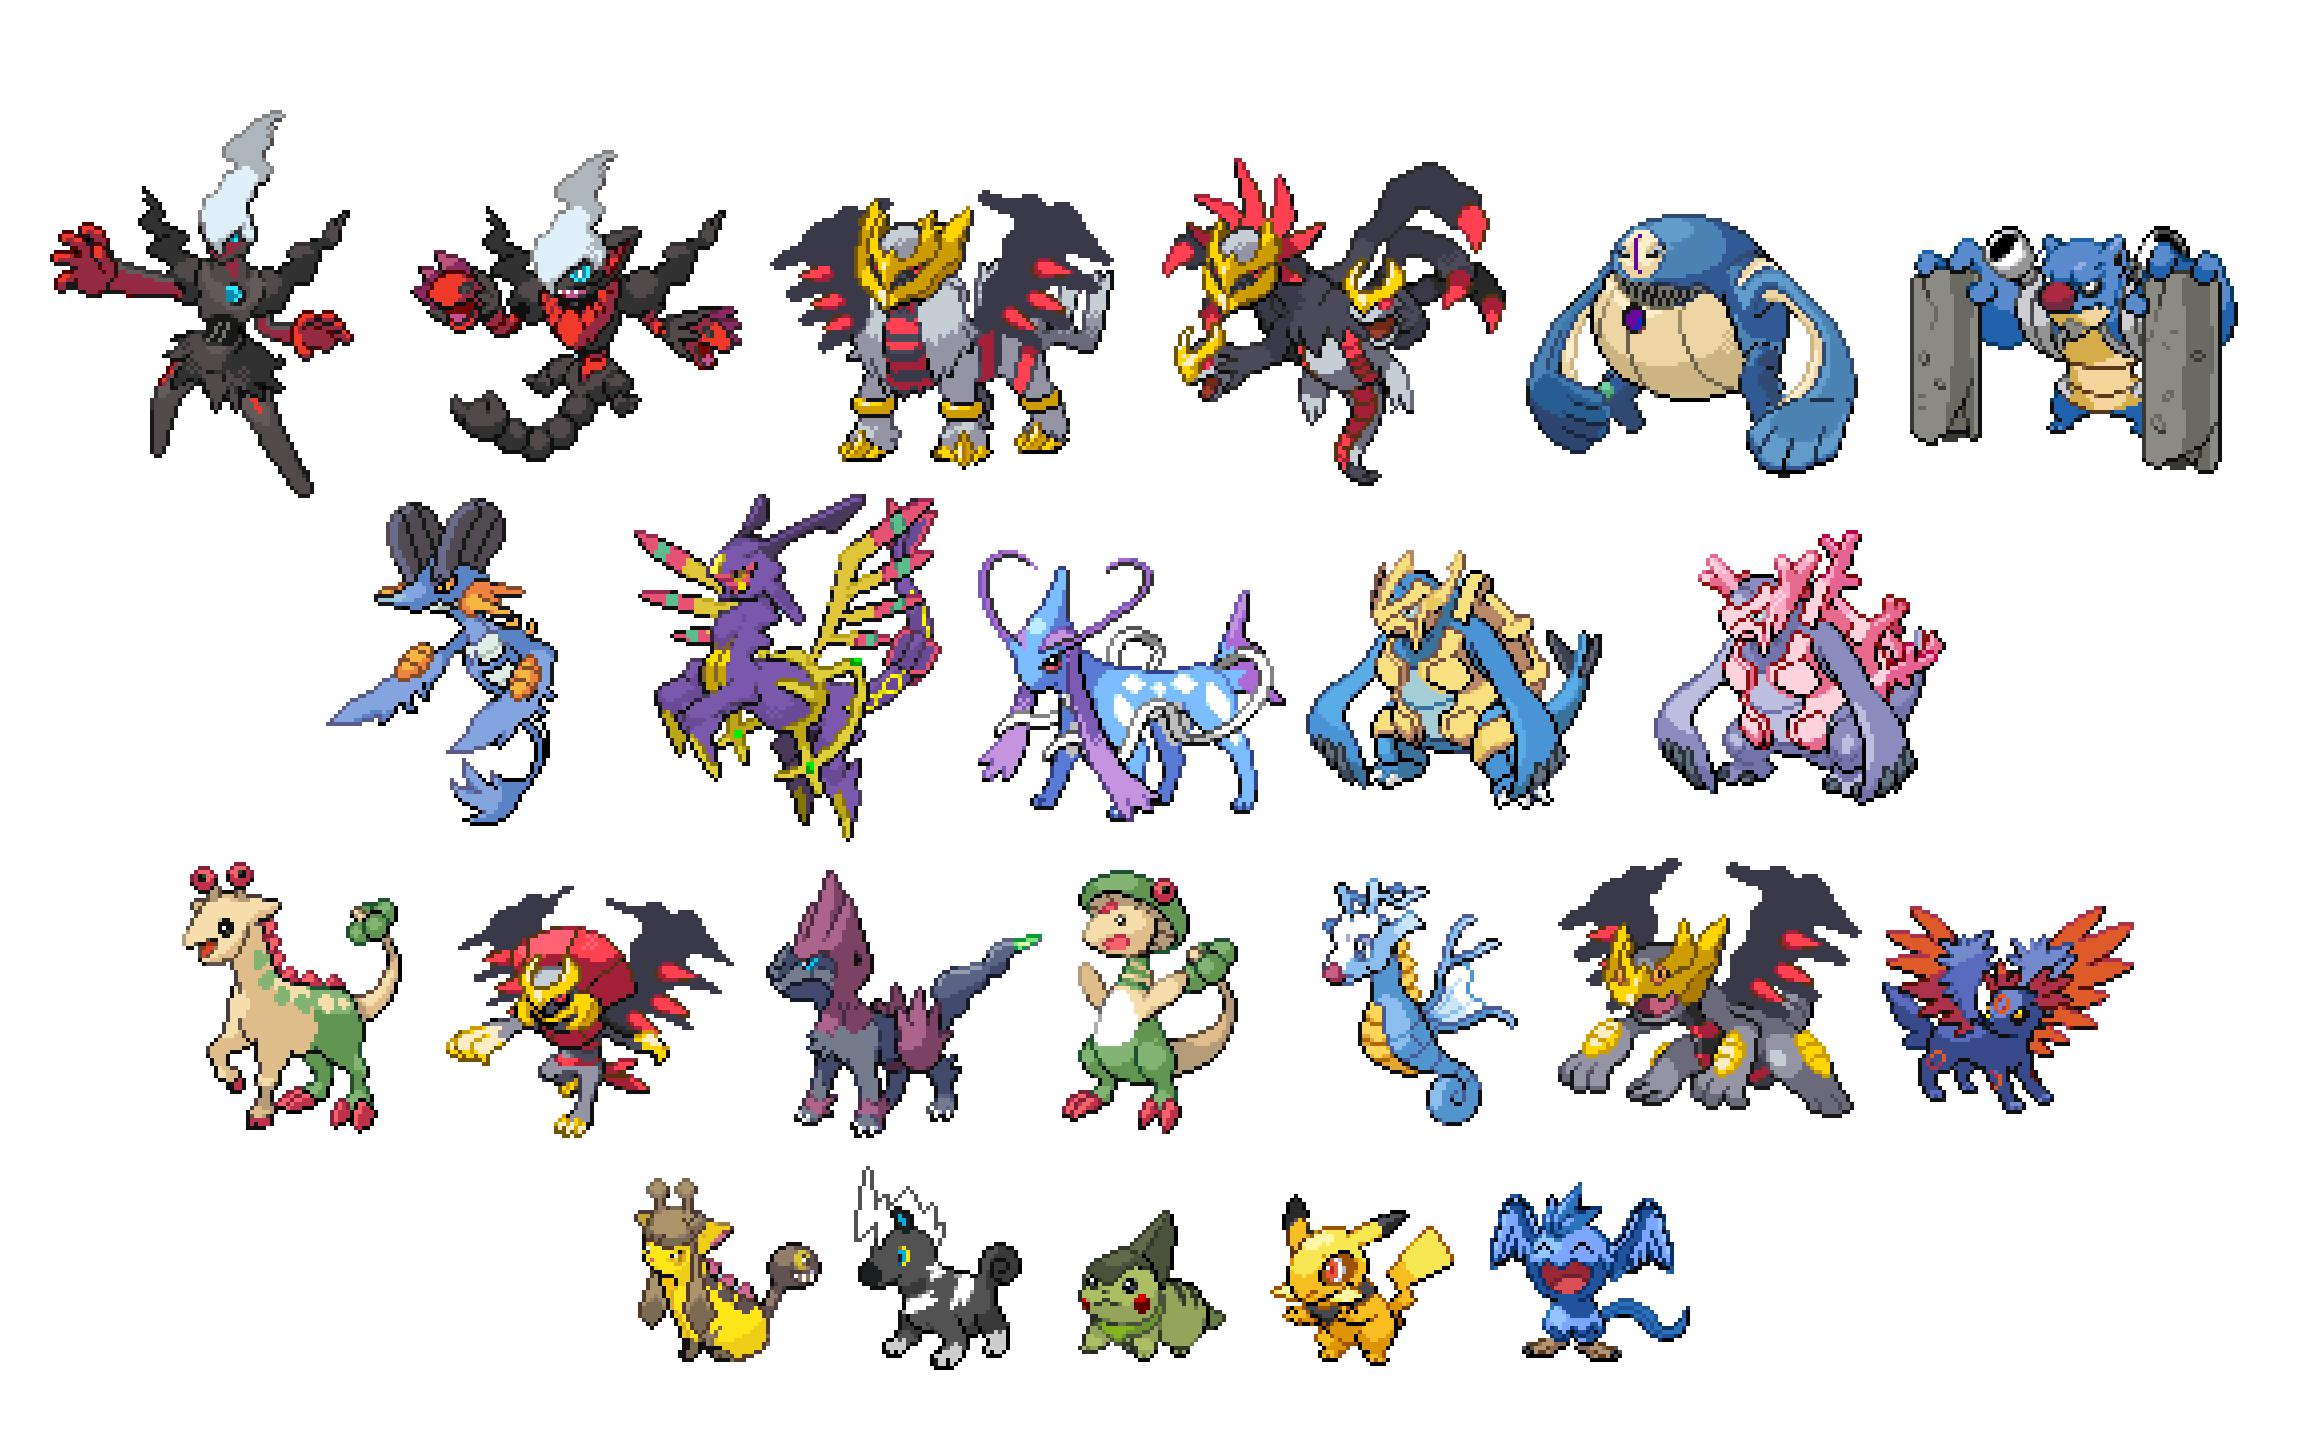 Sprite Dump Pokemon Shuffle Images | Pokemon Images